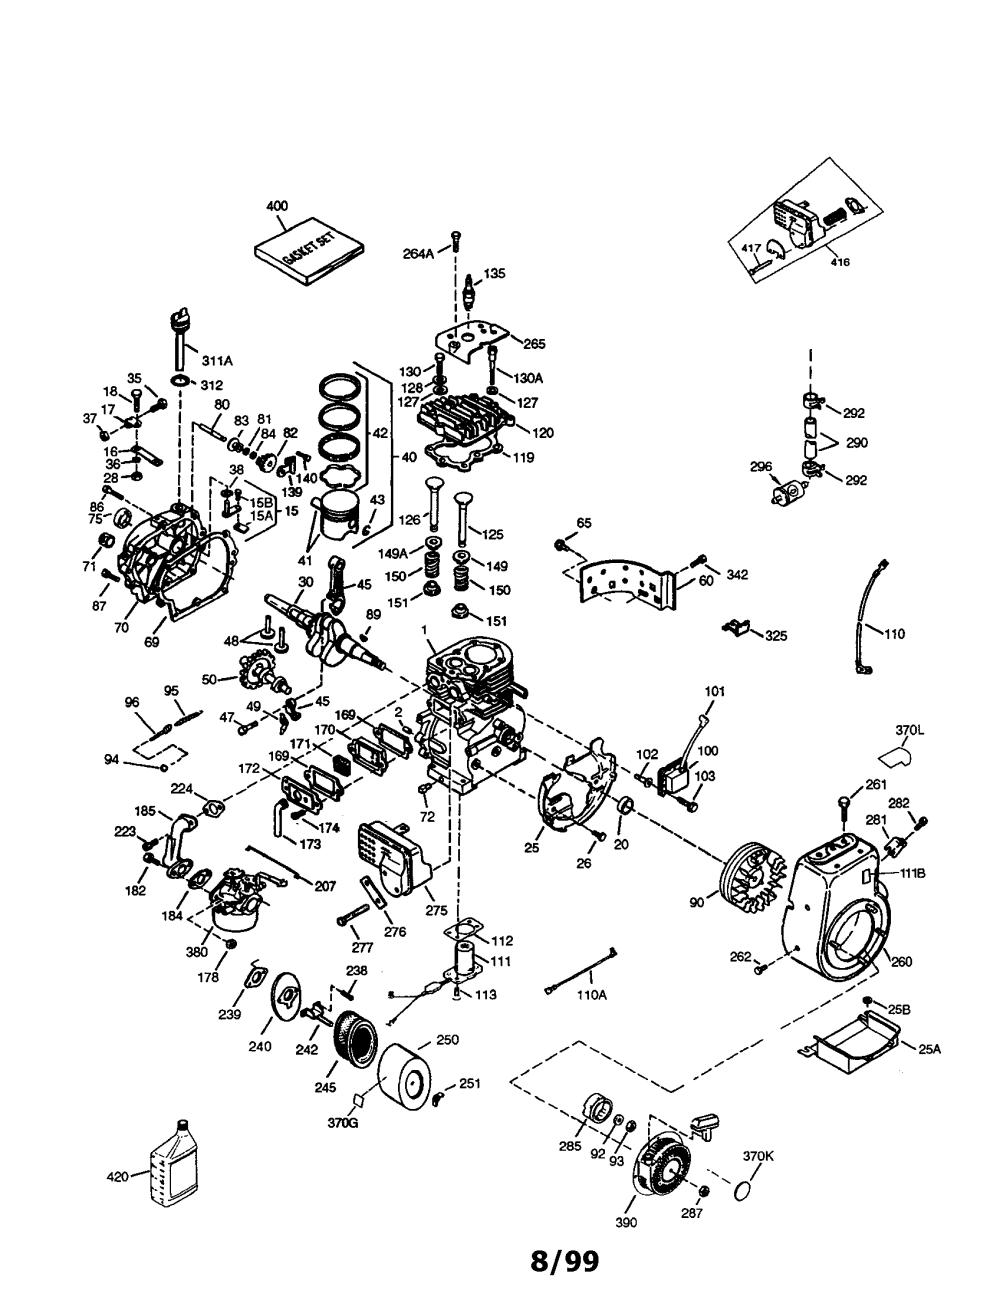 medium resolution of tecumseh model hm100 159409p engine genuine parts rh searspartsdirect com tecumseh engine wiring diagram tecumseh engine diagram